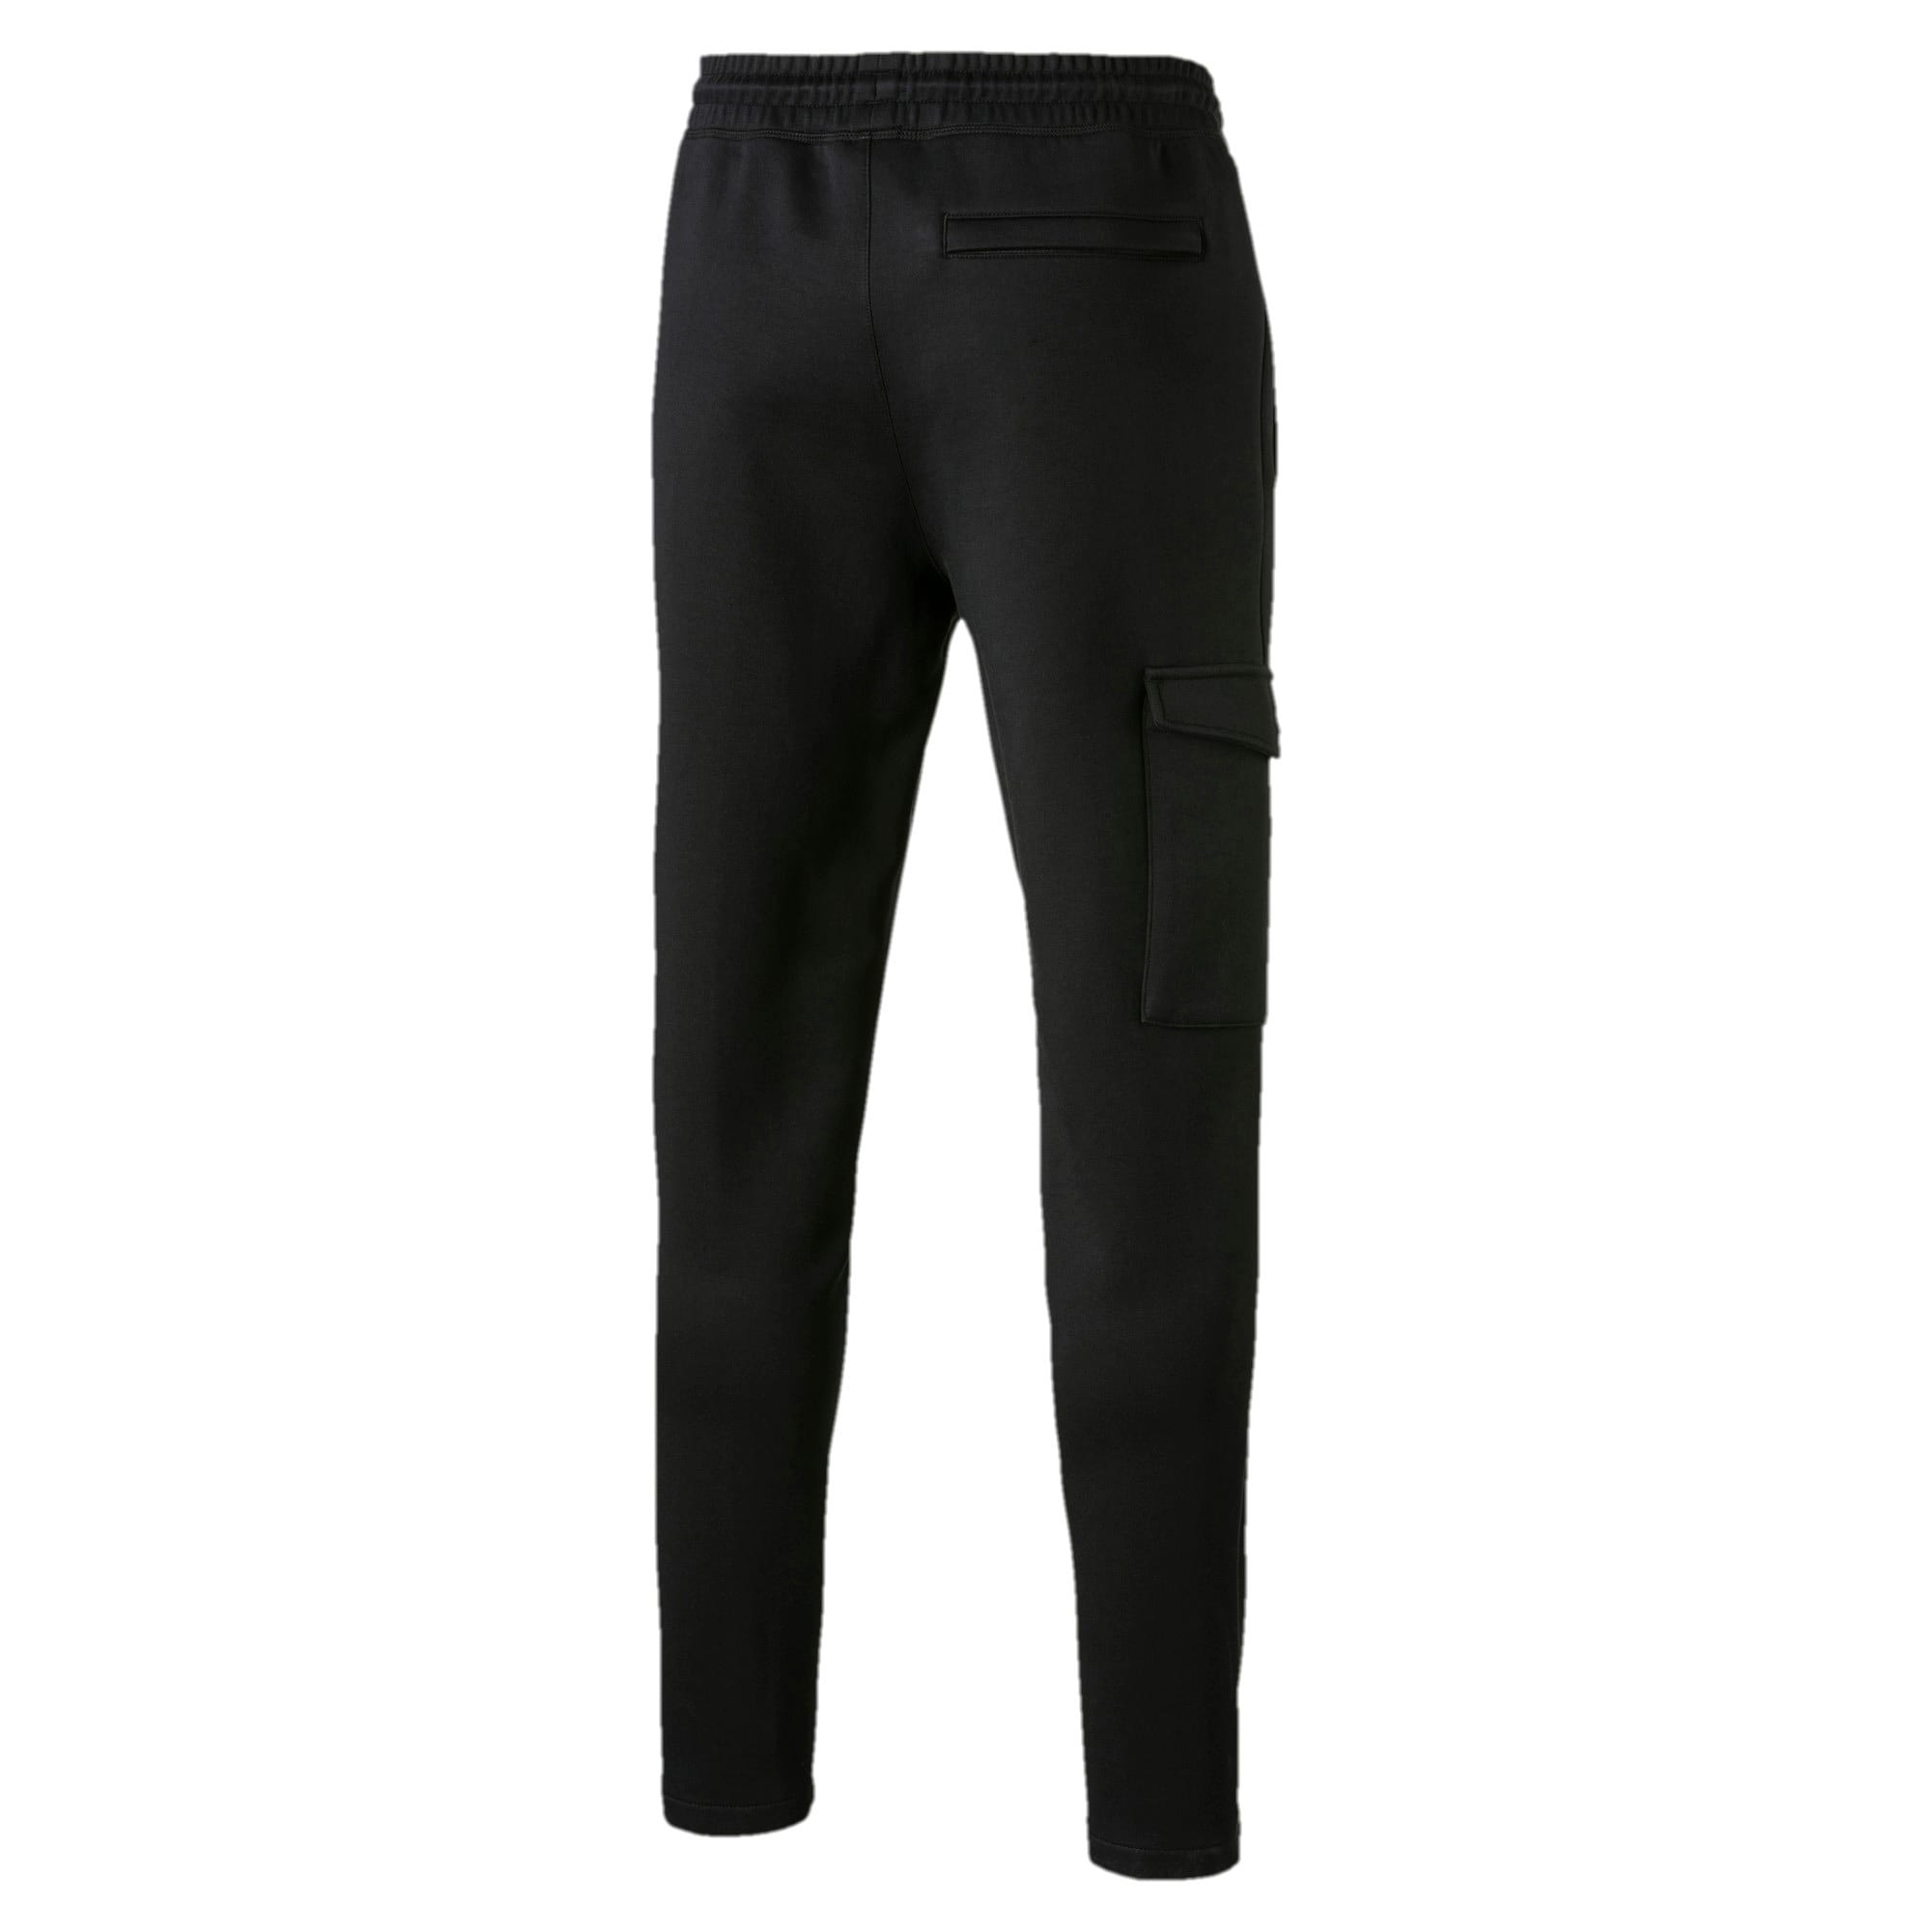 Thumbnail 2 of Classics Men's Open Hem Pants, Cotton Black, medium